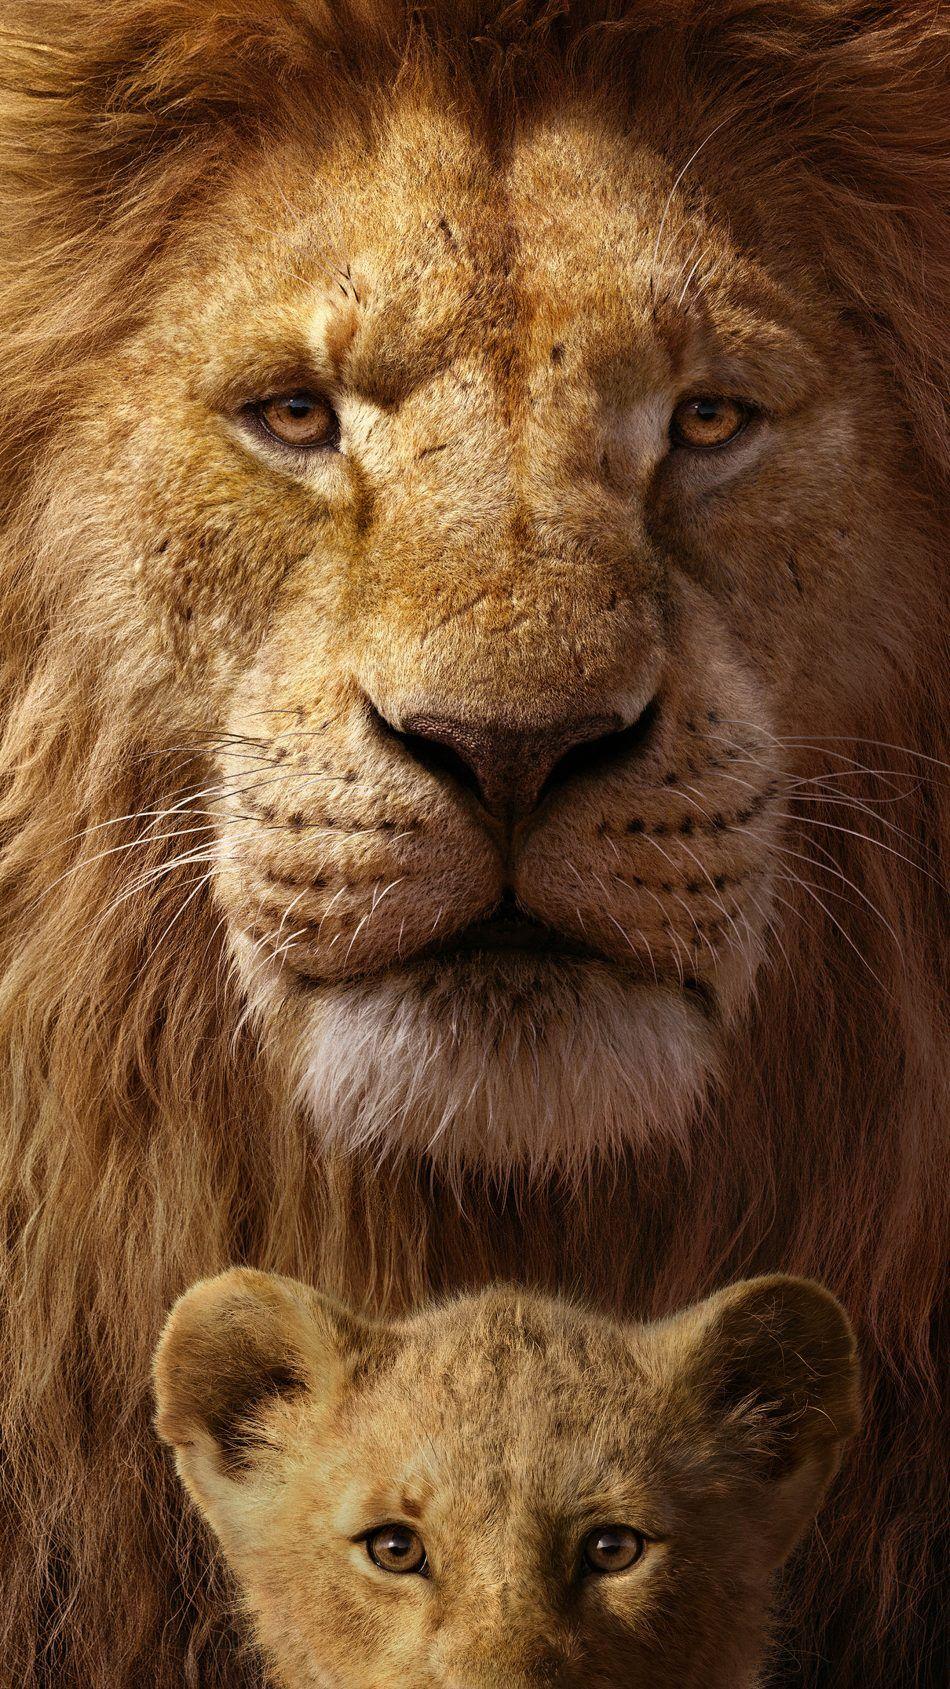 Pin On Fondos De Pantalla Animales Lock screen lion king wallpaper hd 2019